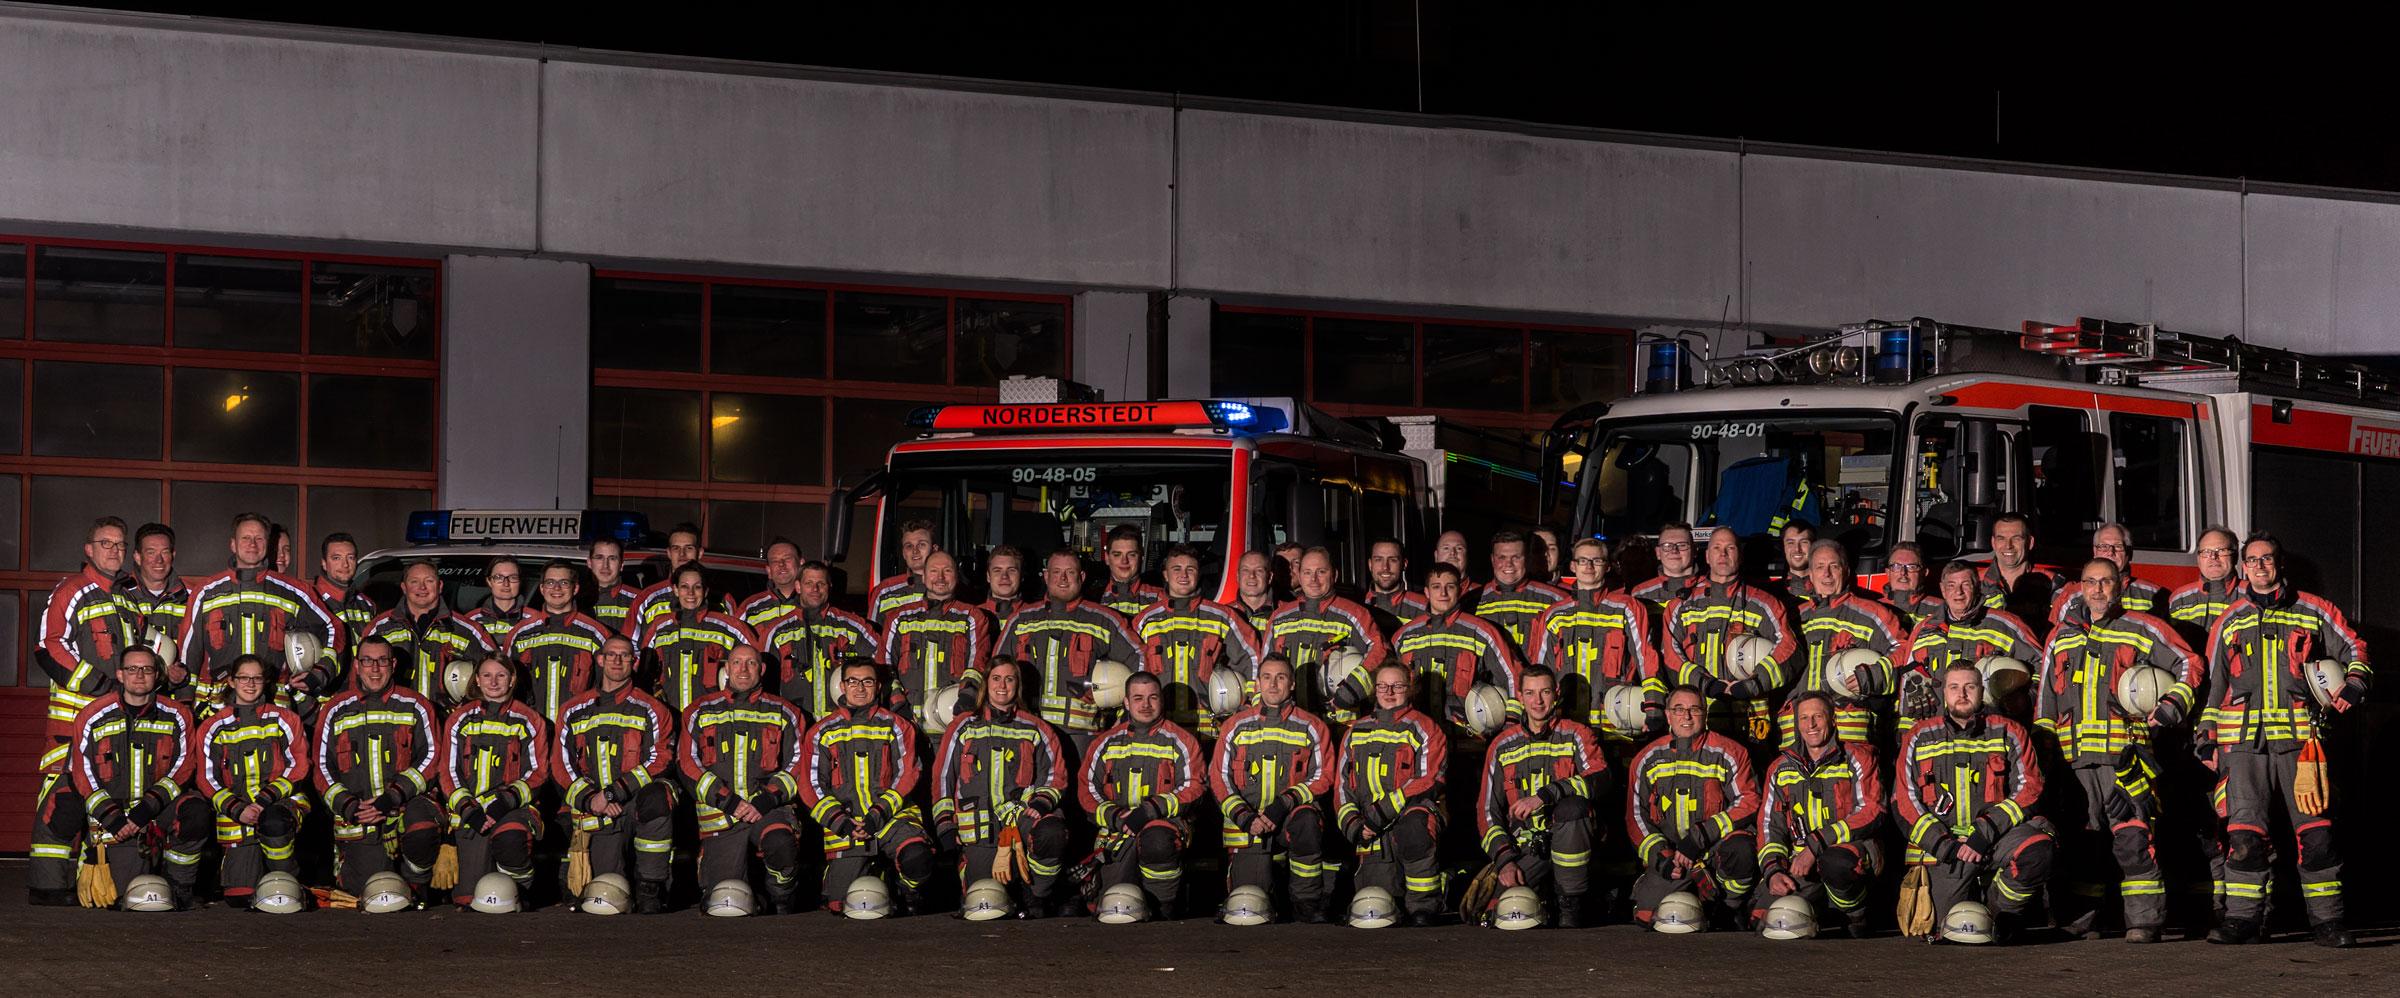 Freiwillige Feuerwehr Harksheide Die Wehr